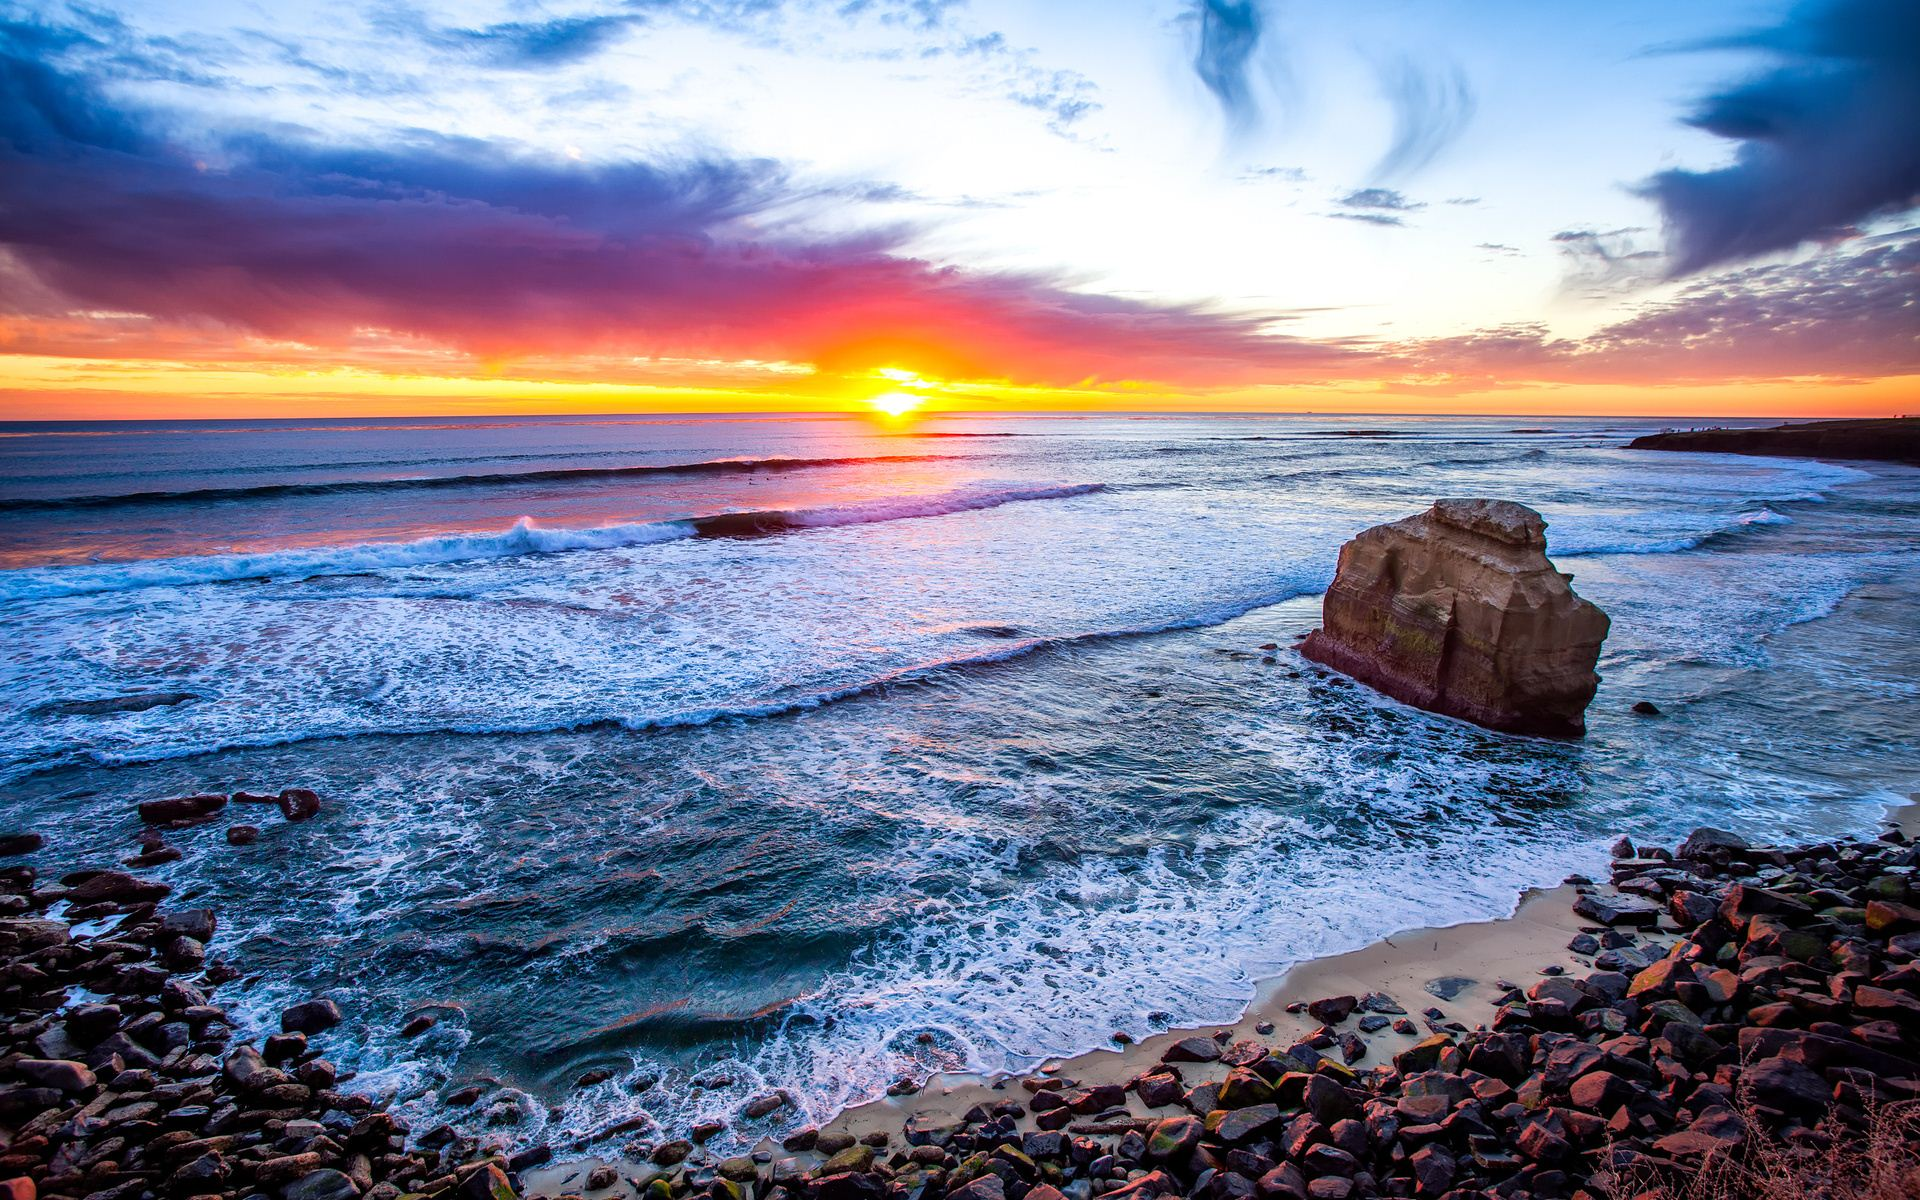 San Diego Beach Sunset HD Wallpapers 1920x1200